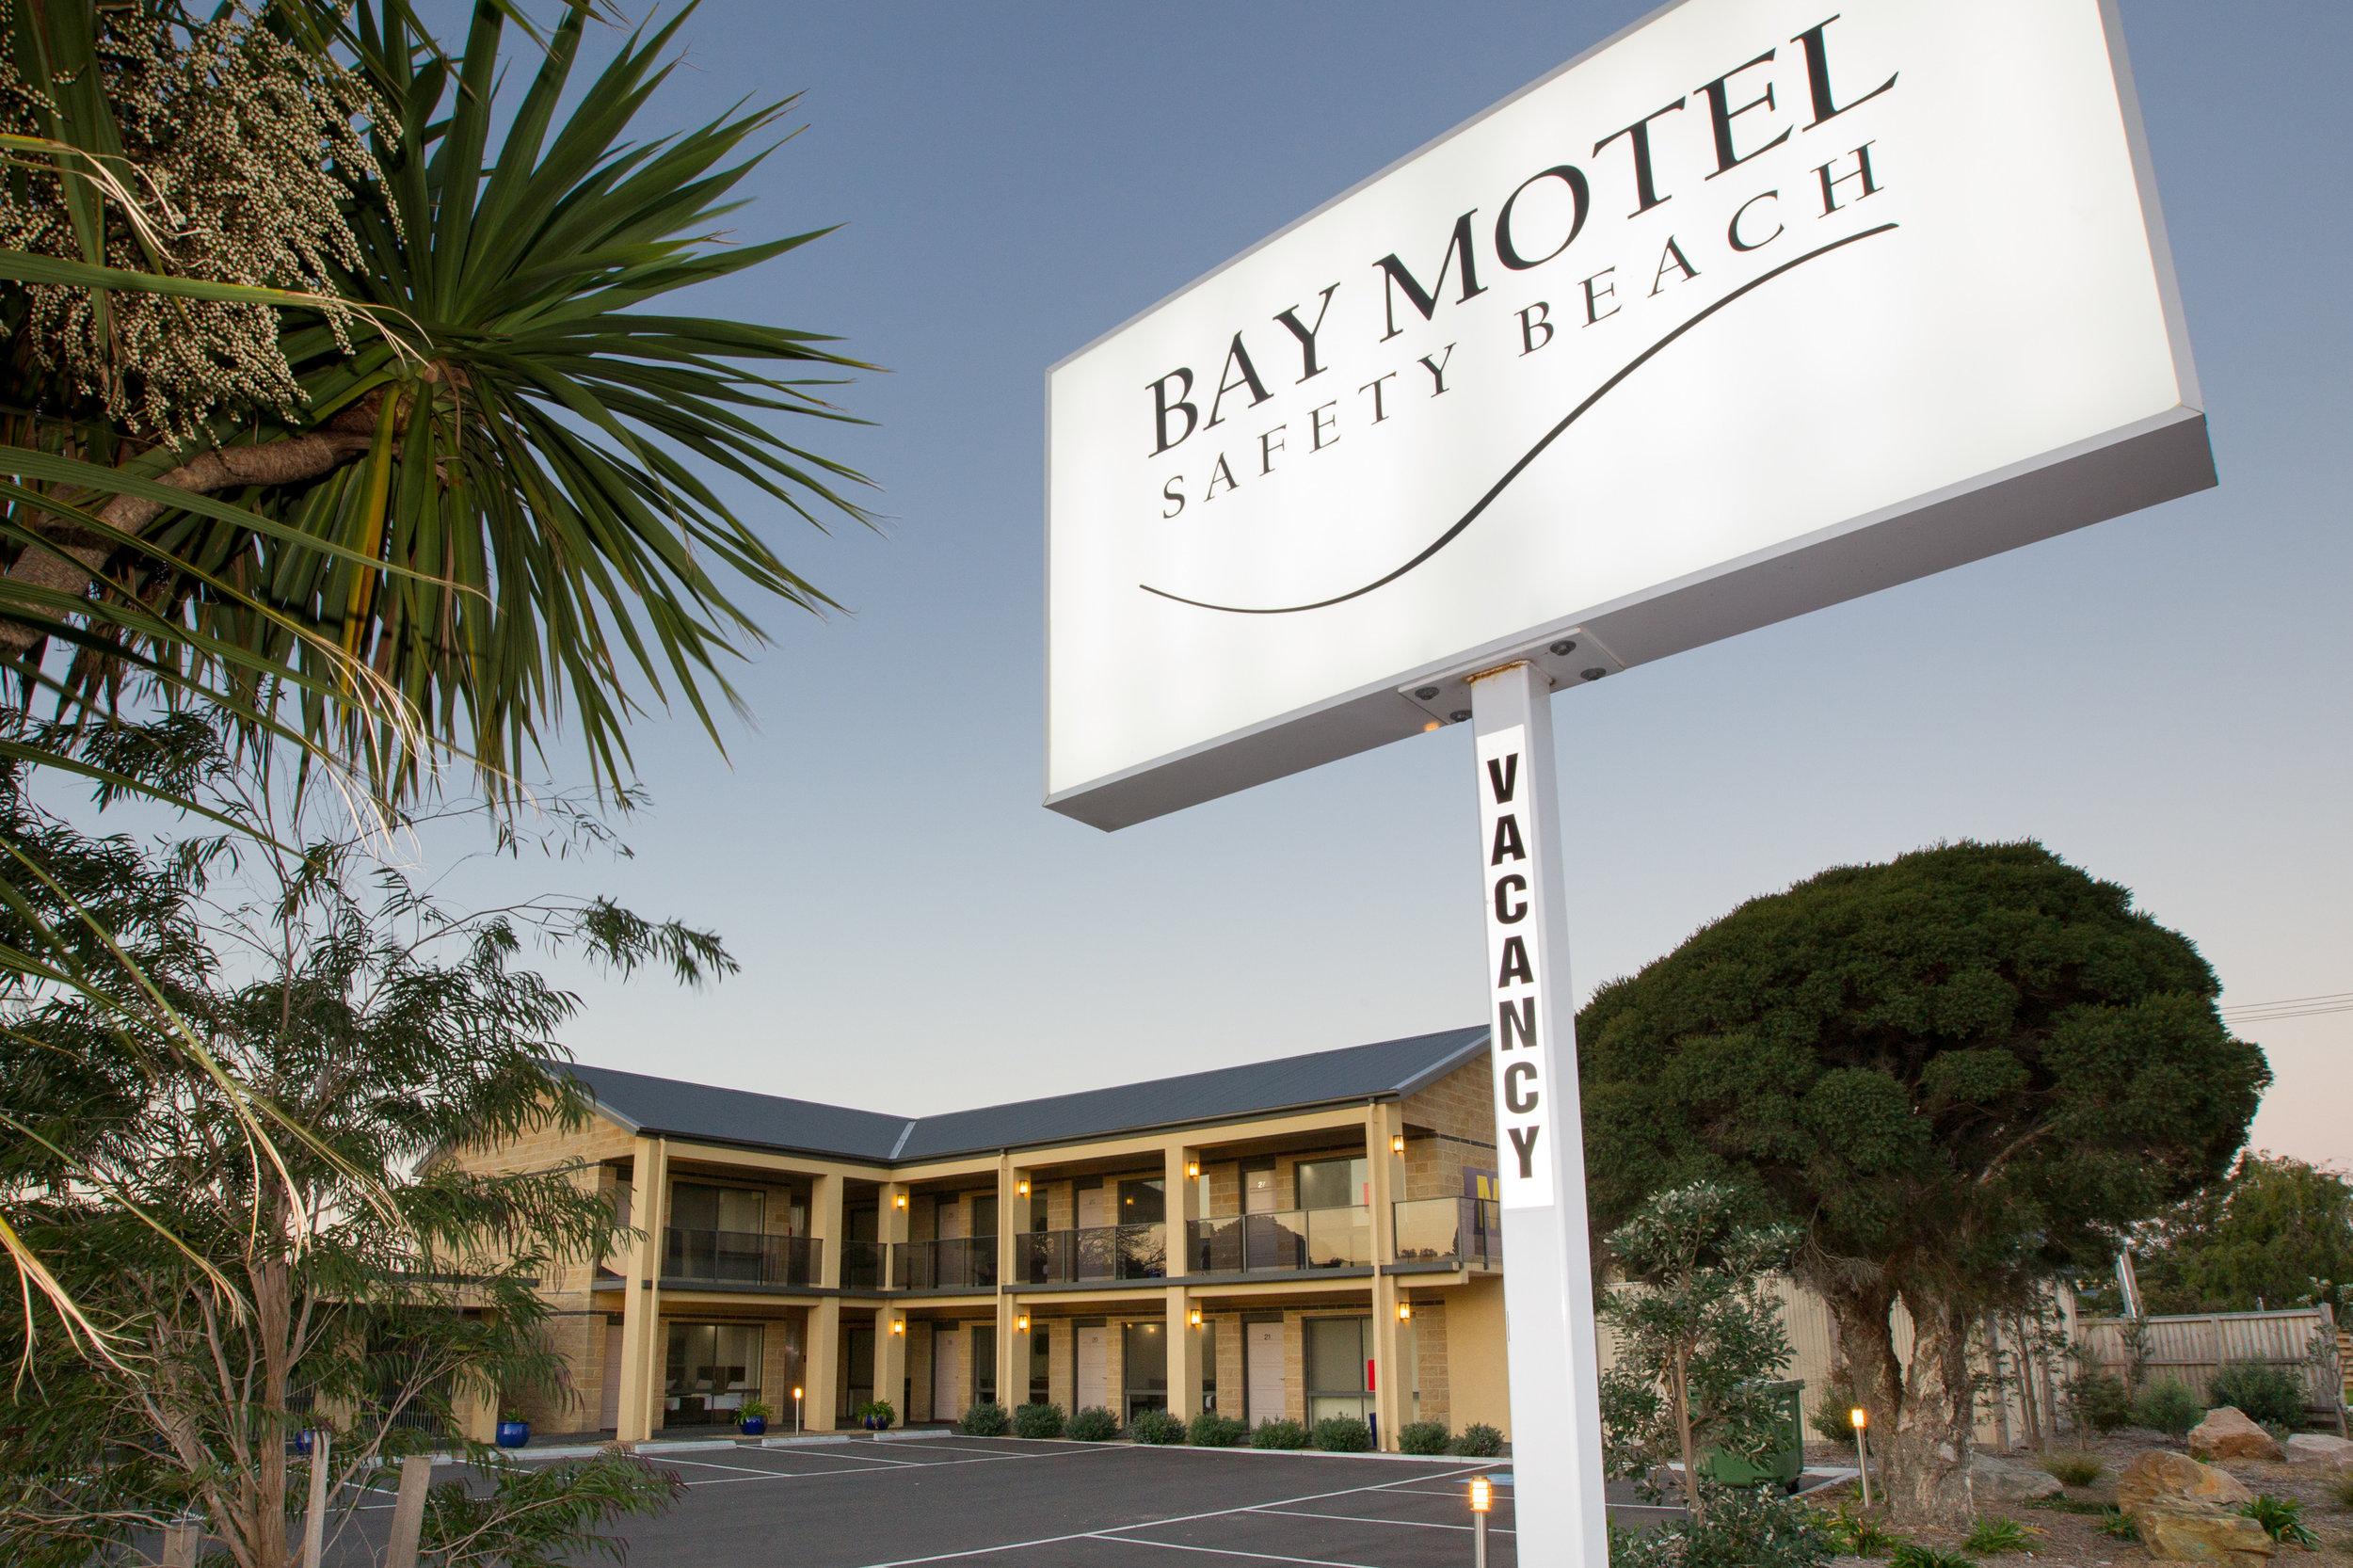 Bay Motel Exterior Day.jpg